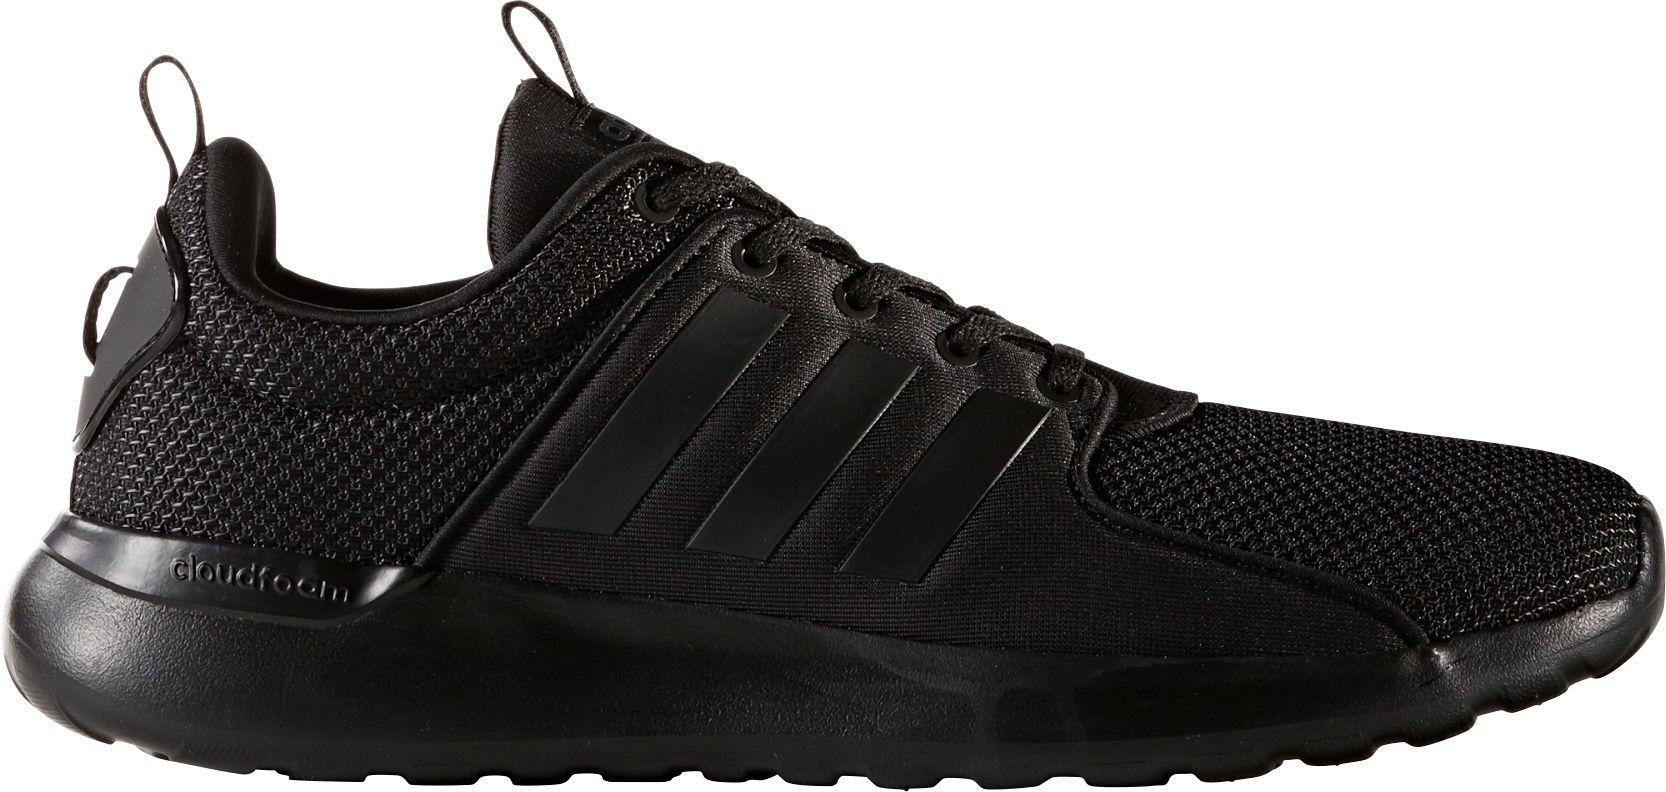 adidas Neo Men's Lite Racer Casual Shoes, Size: 13.0, Black